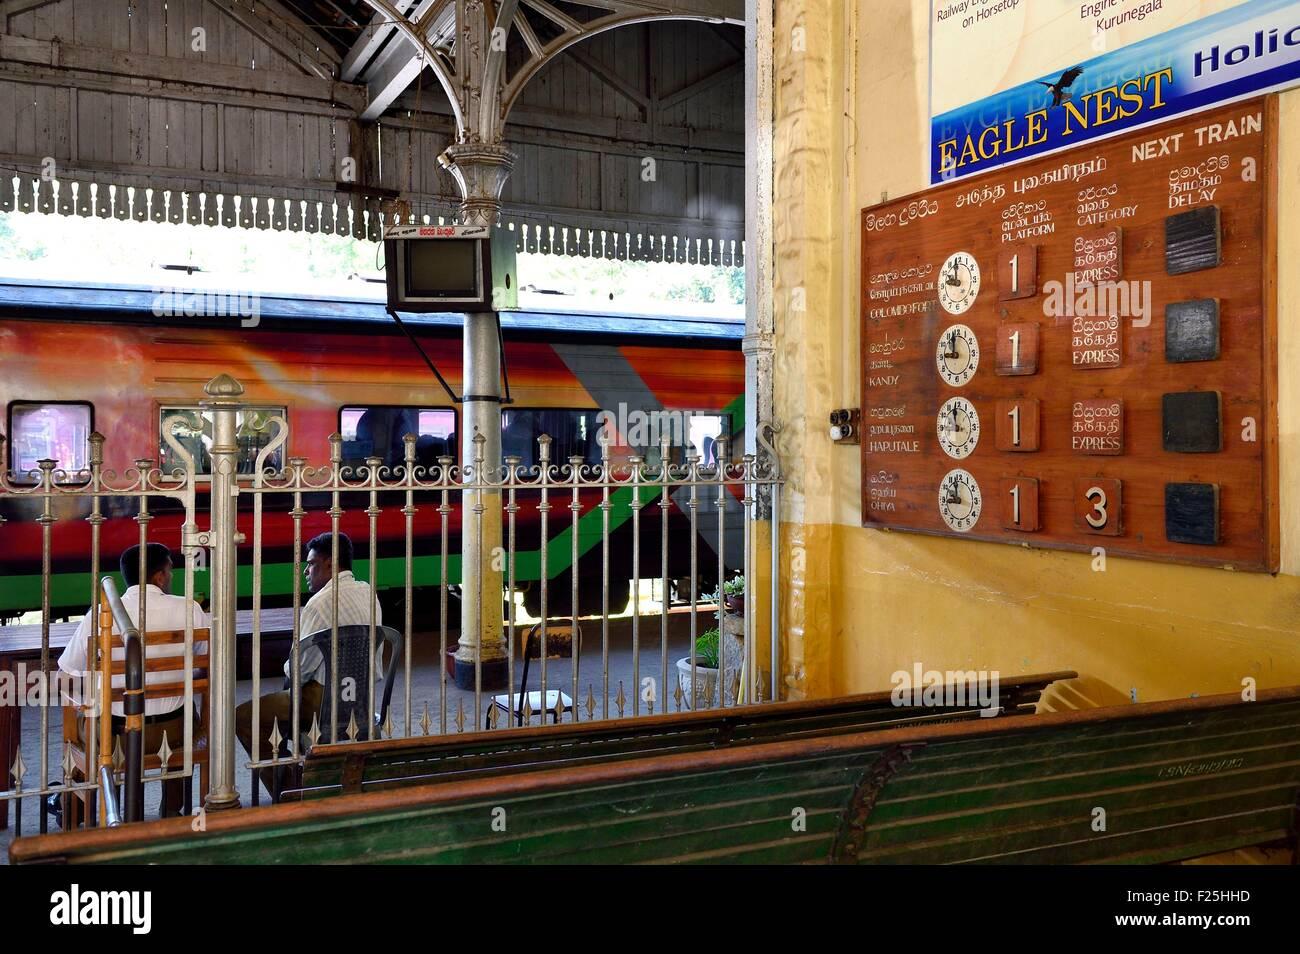 Sri Lanka, Uva Province, Badulla train station, schedules table display - Stock Image